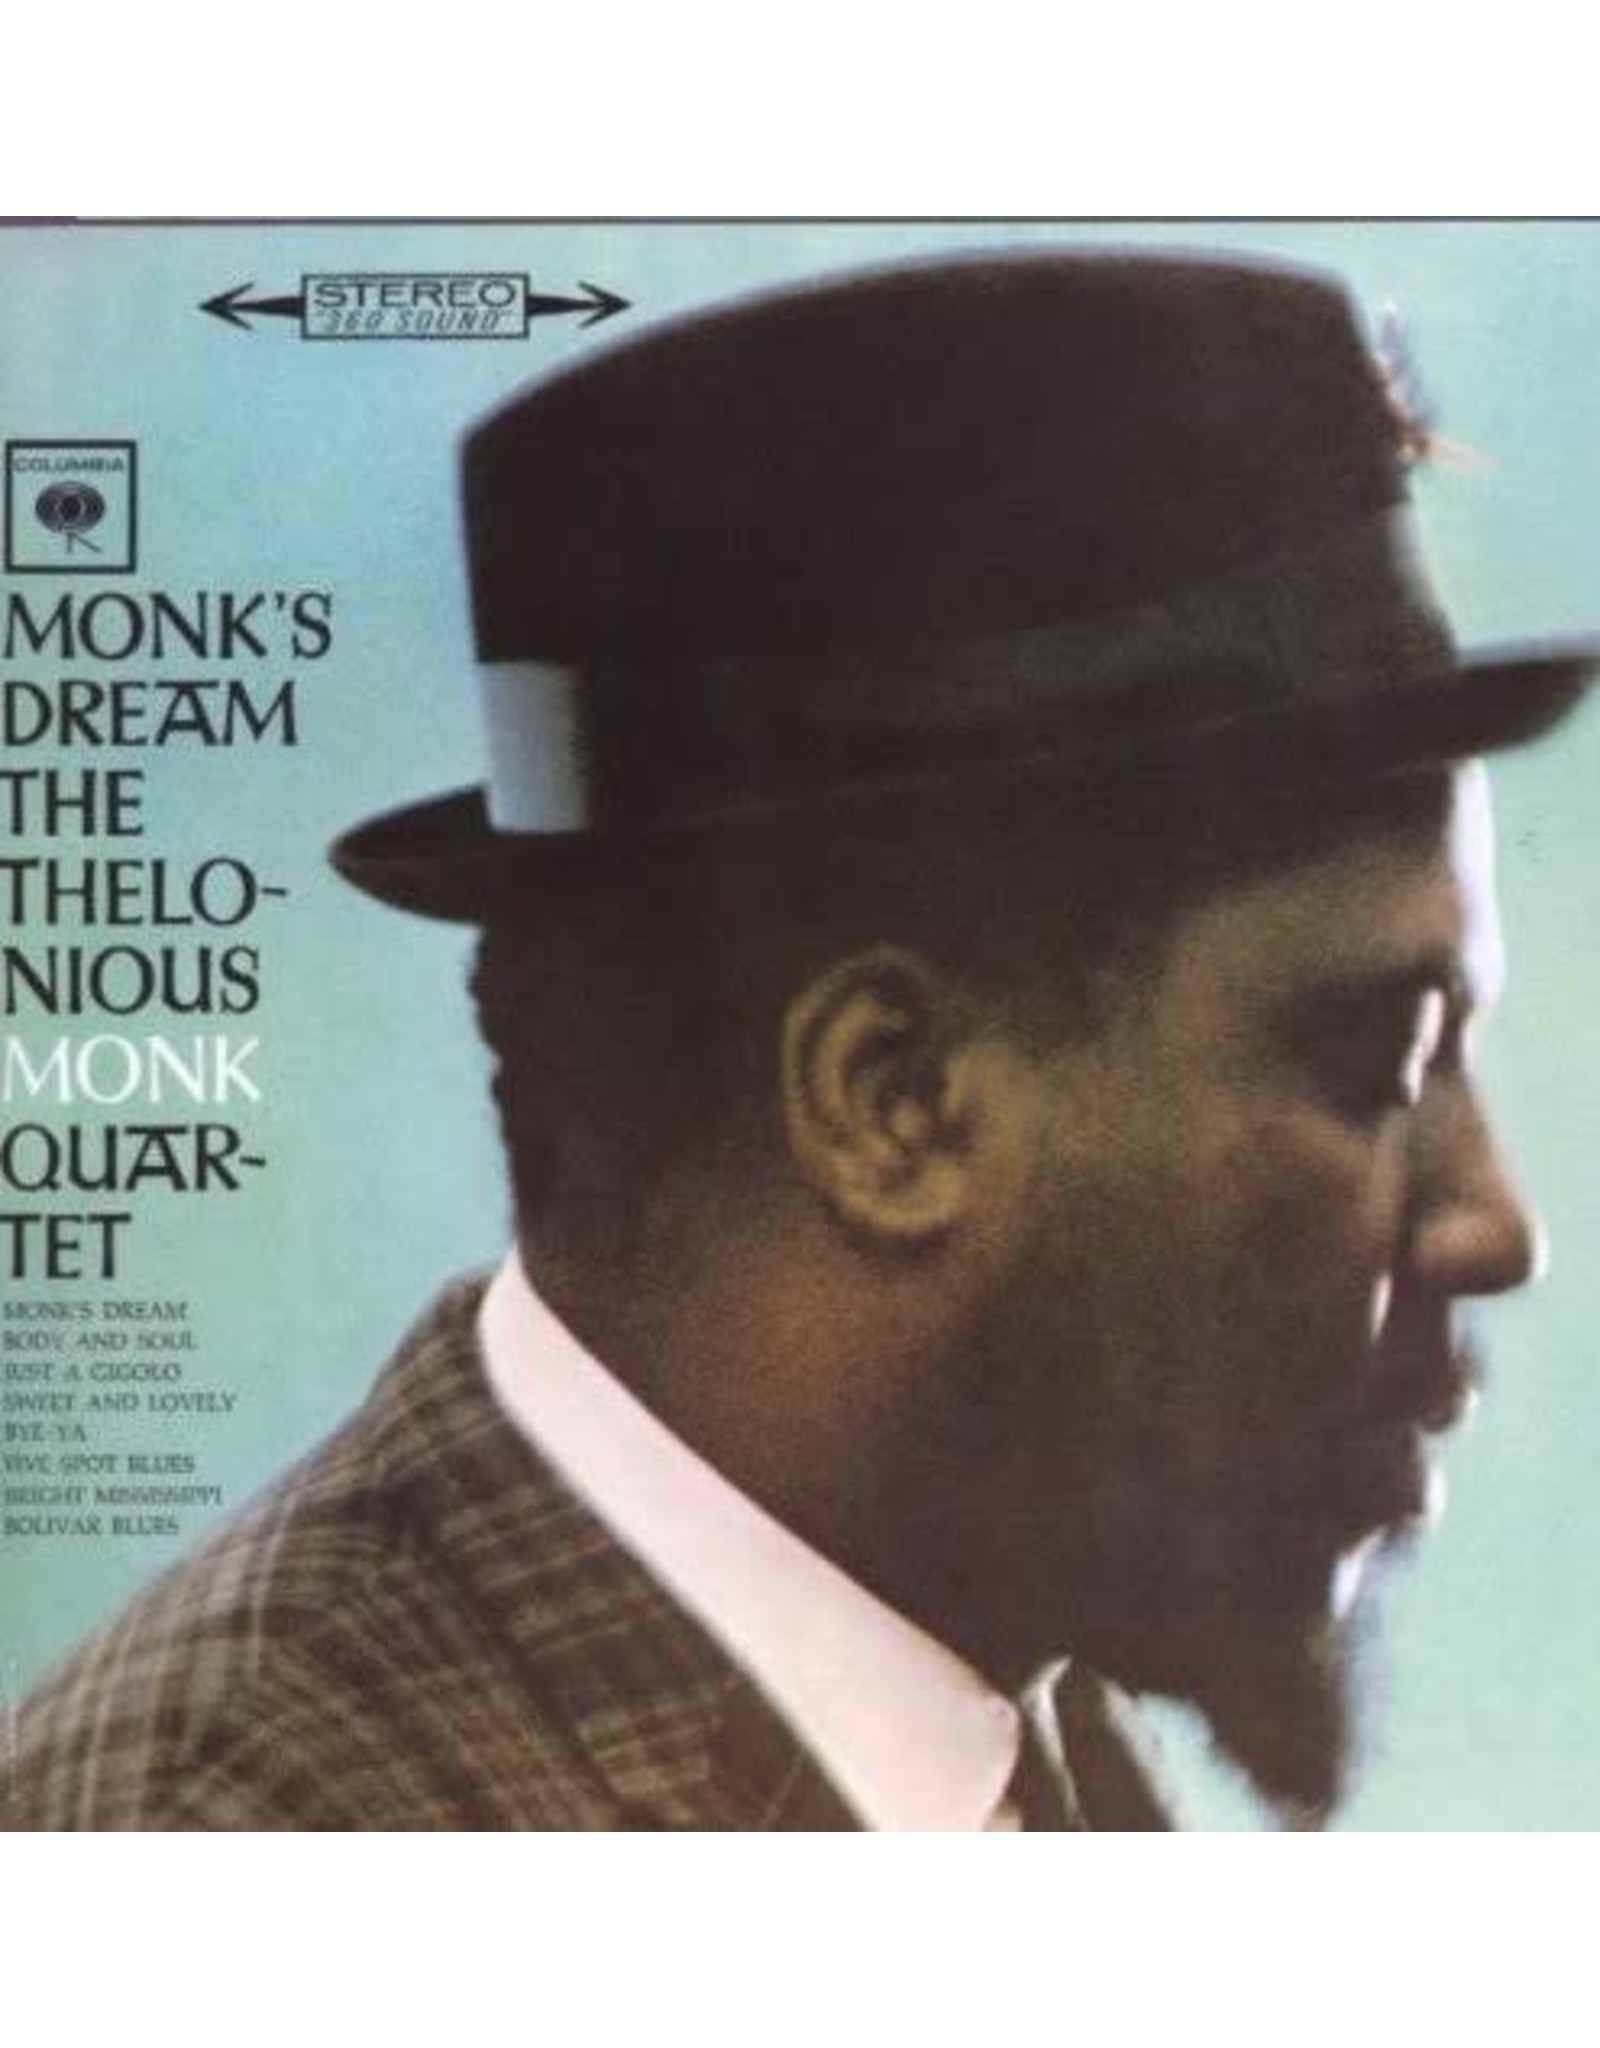 New Vinyl Thelonious Monk - Monk's Dream (Colored) LP